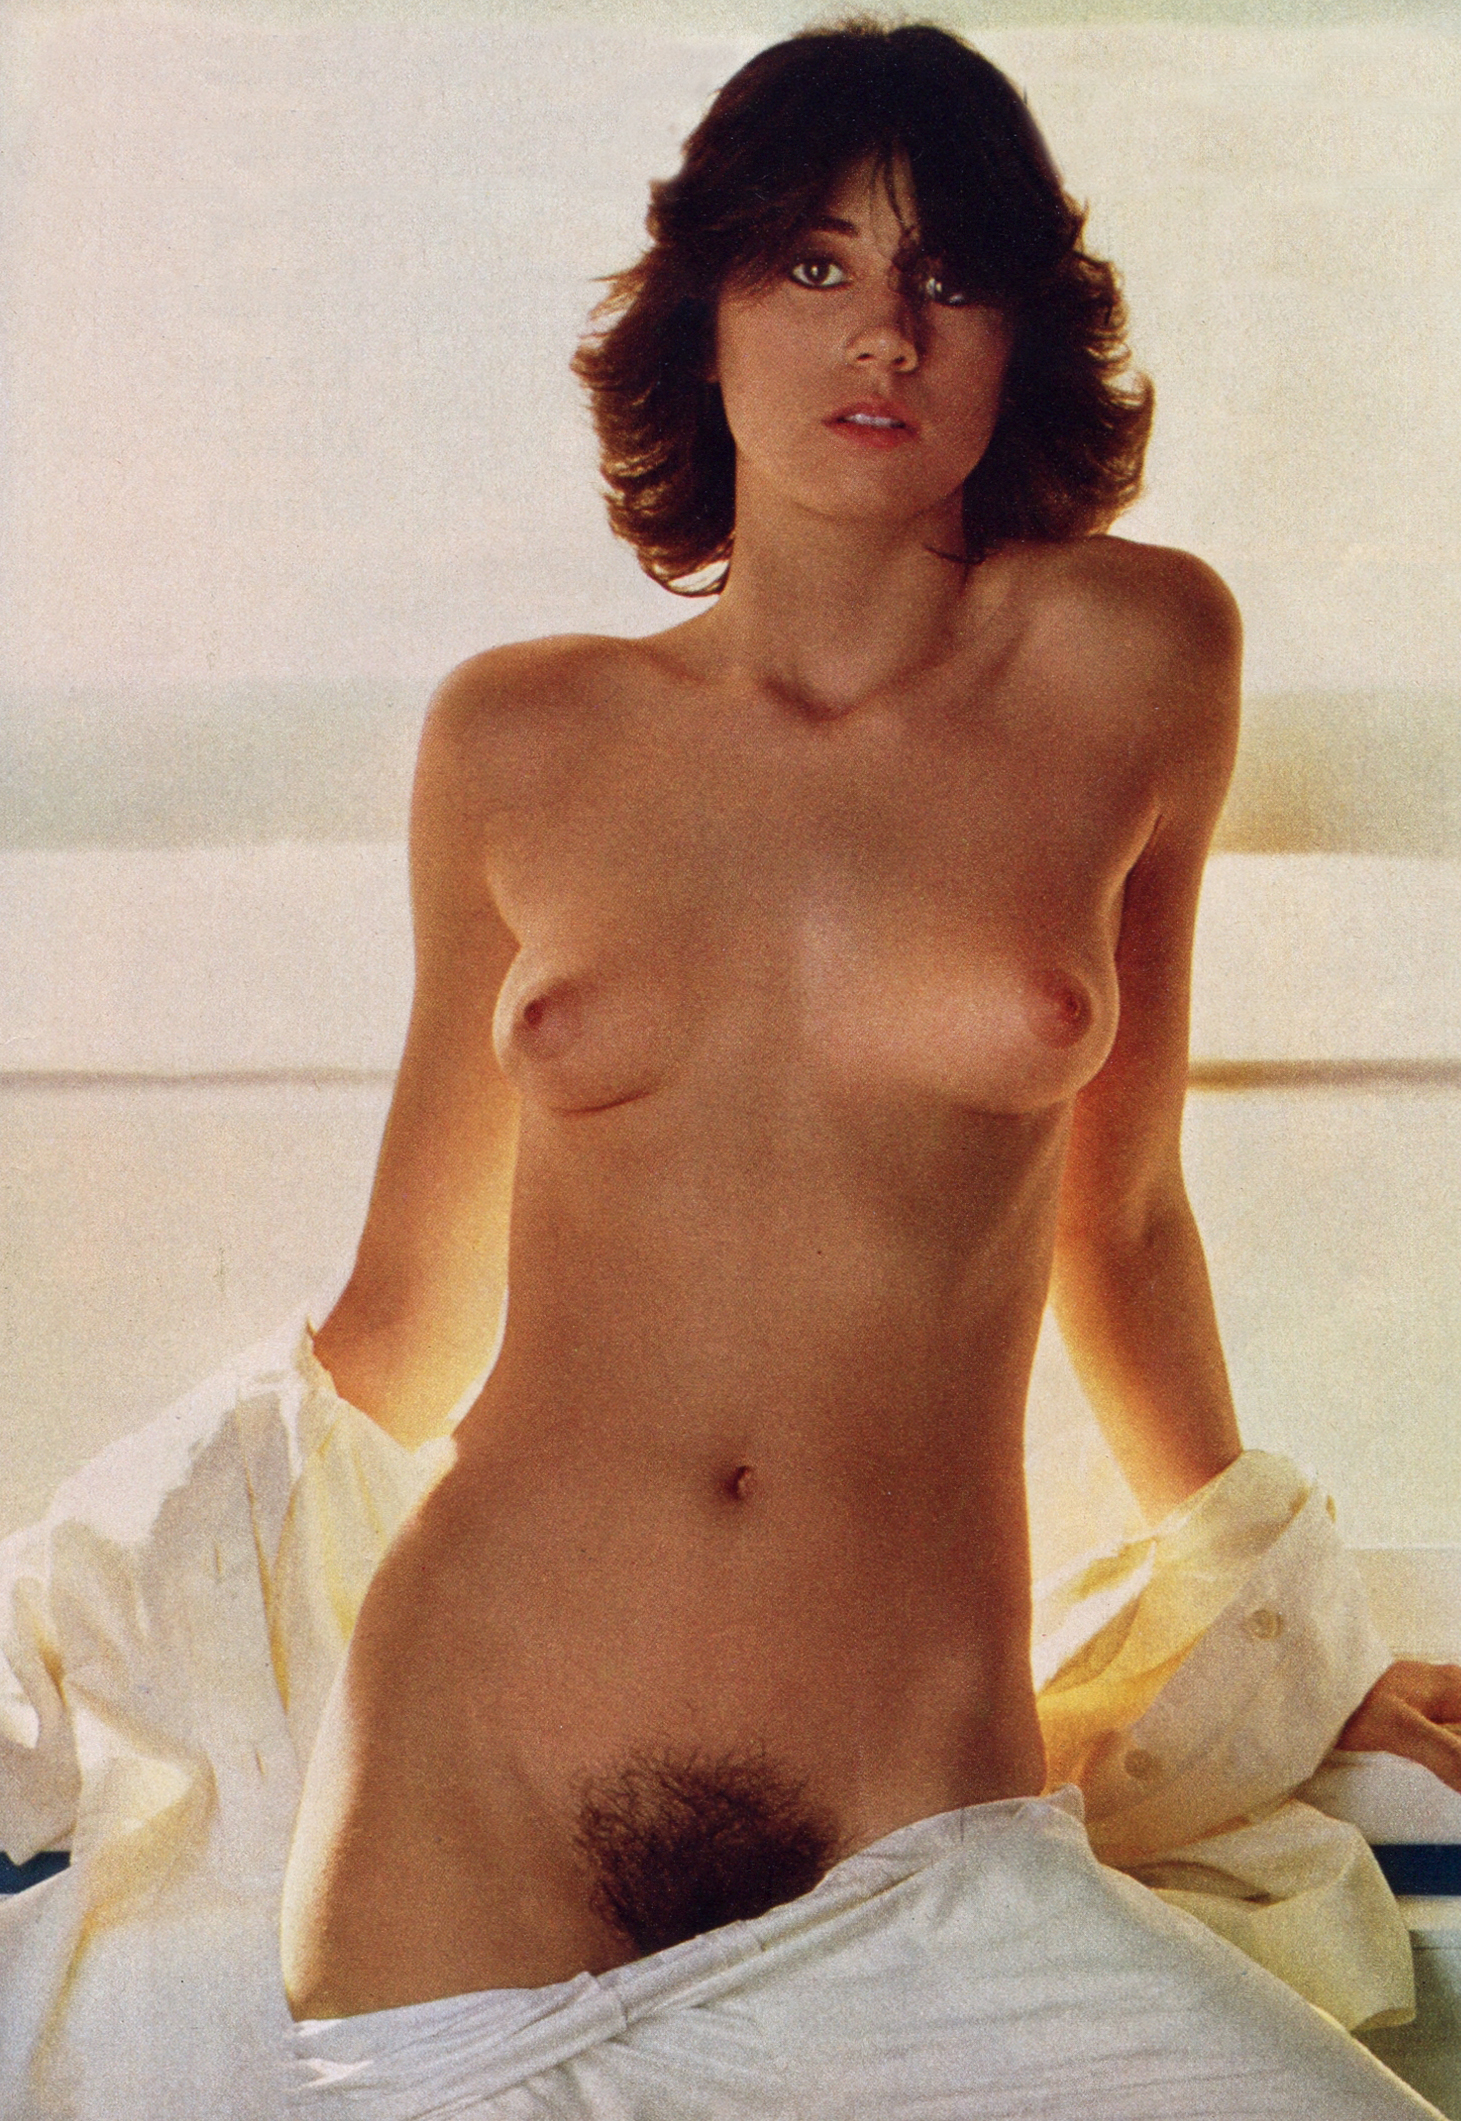 Athena Marie Oui magazine March 1978 01.jpg